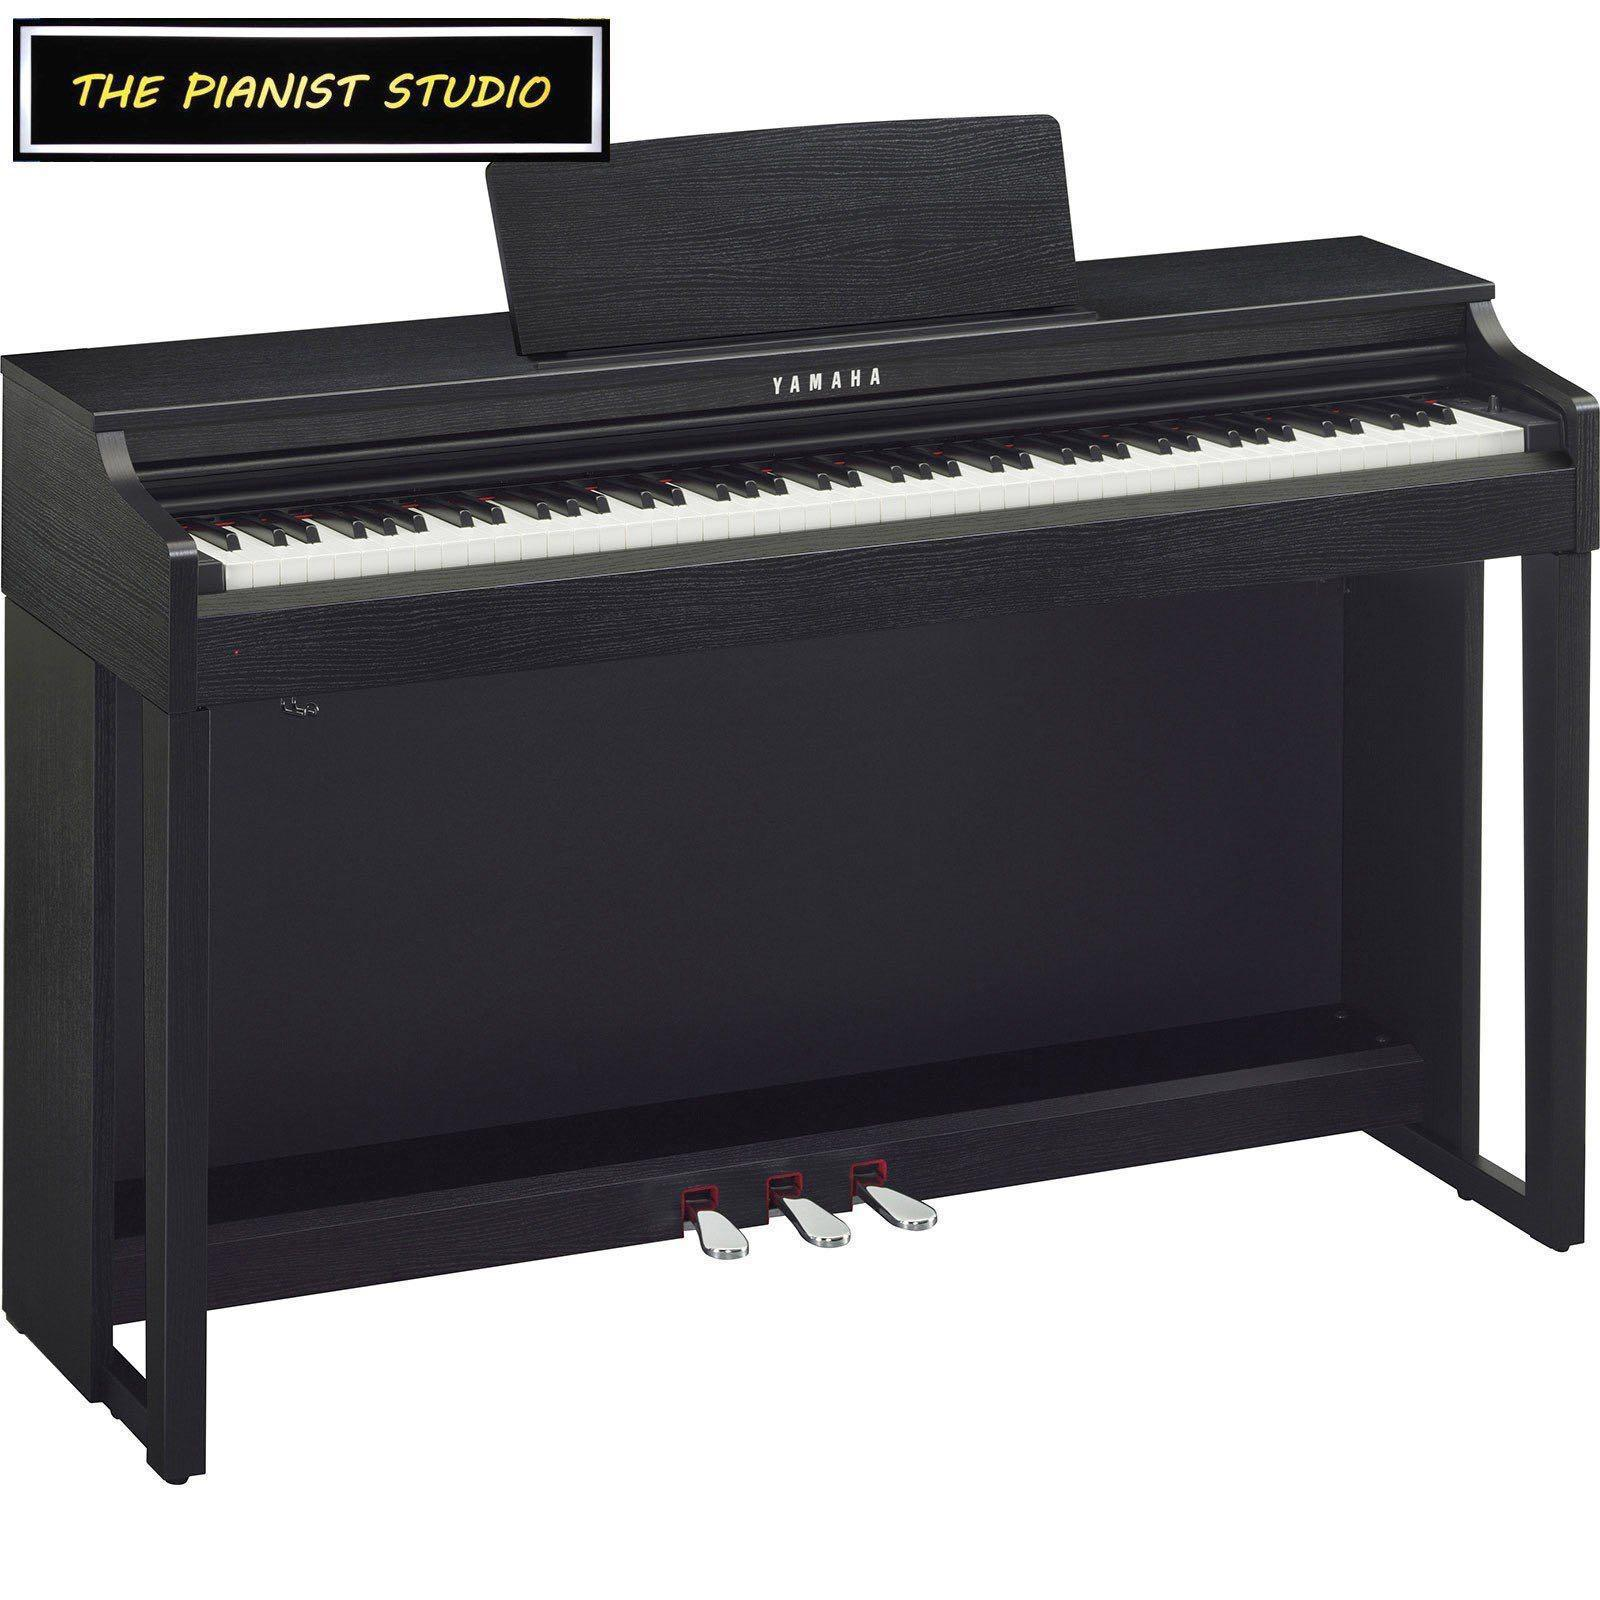 THE PIANIST STUDIO -YAMAHA CLAVINOVA DIGITAL PIANO CLP625,CLP635,CLP645,CLP665,CLP675,CLP685 SALE!